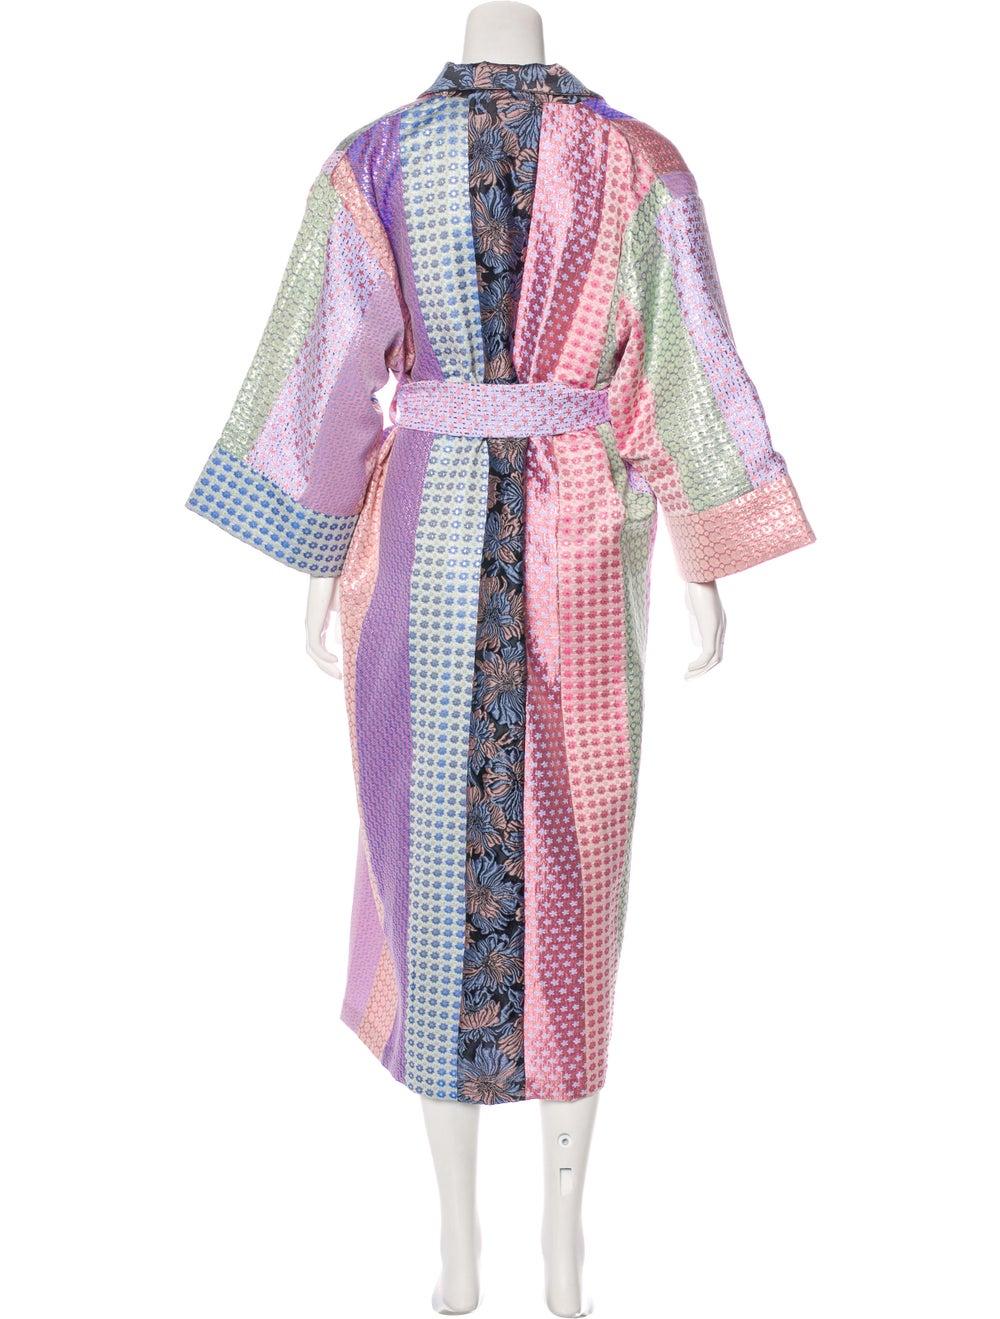 Natasha Zinko Patchwork Brocade Robe Pink - image 3